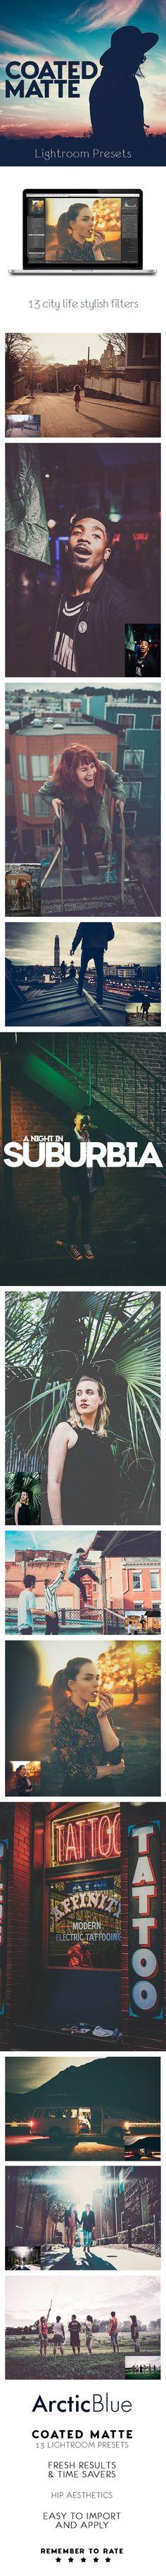 Coated Matte Lightroom Presets. Download here: http://graphicriver.net/item/coated-matte-lightroom-presets/13376320?s_rank=1&ref=yinkira